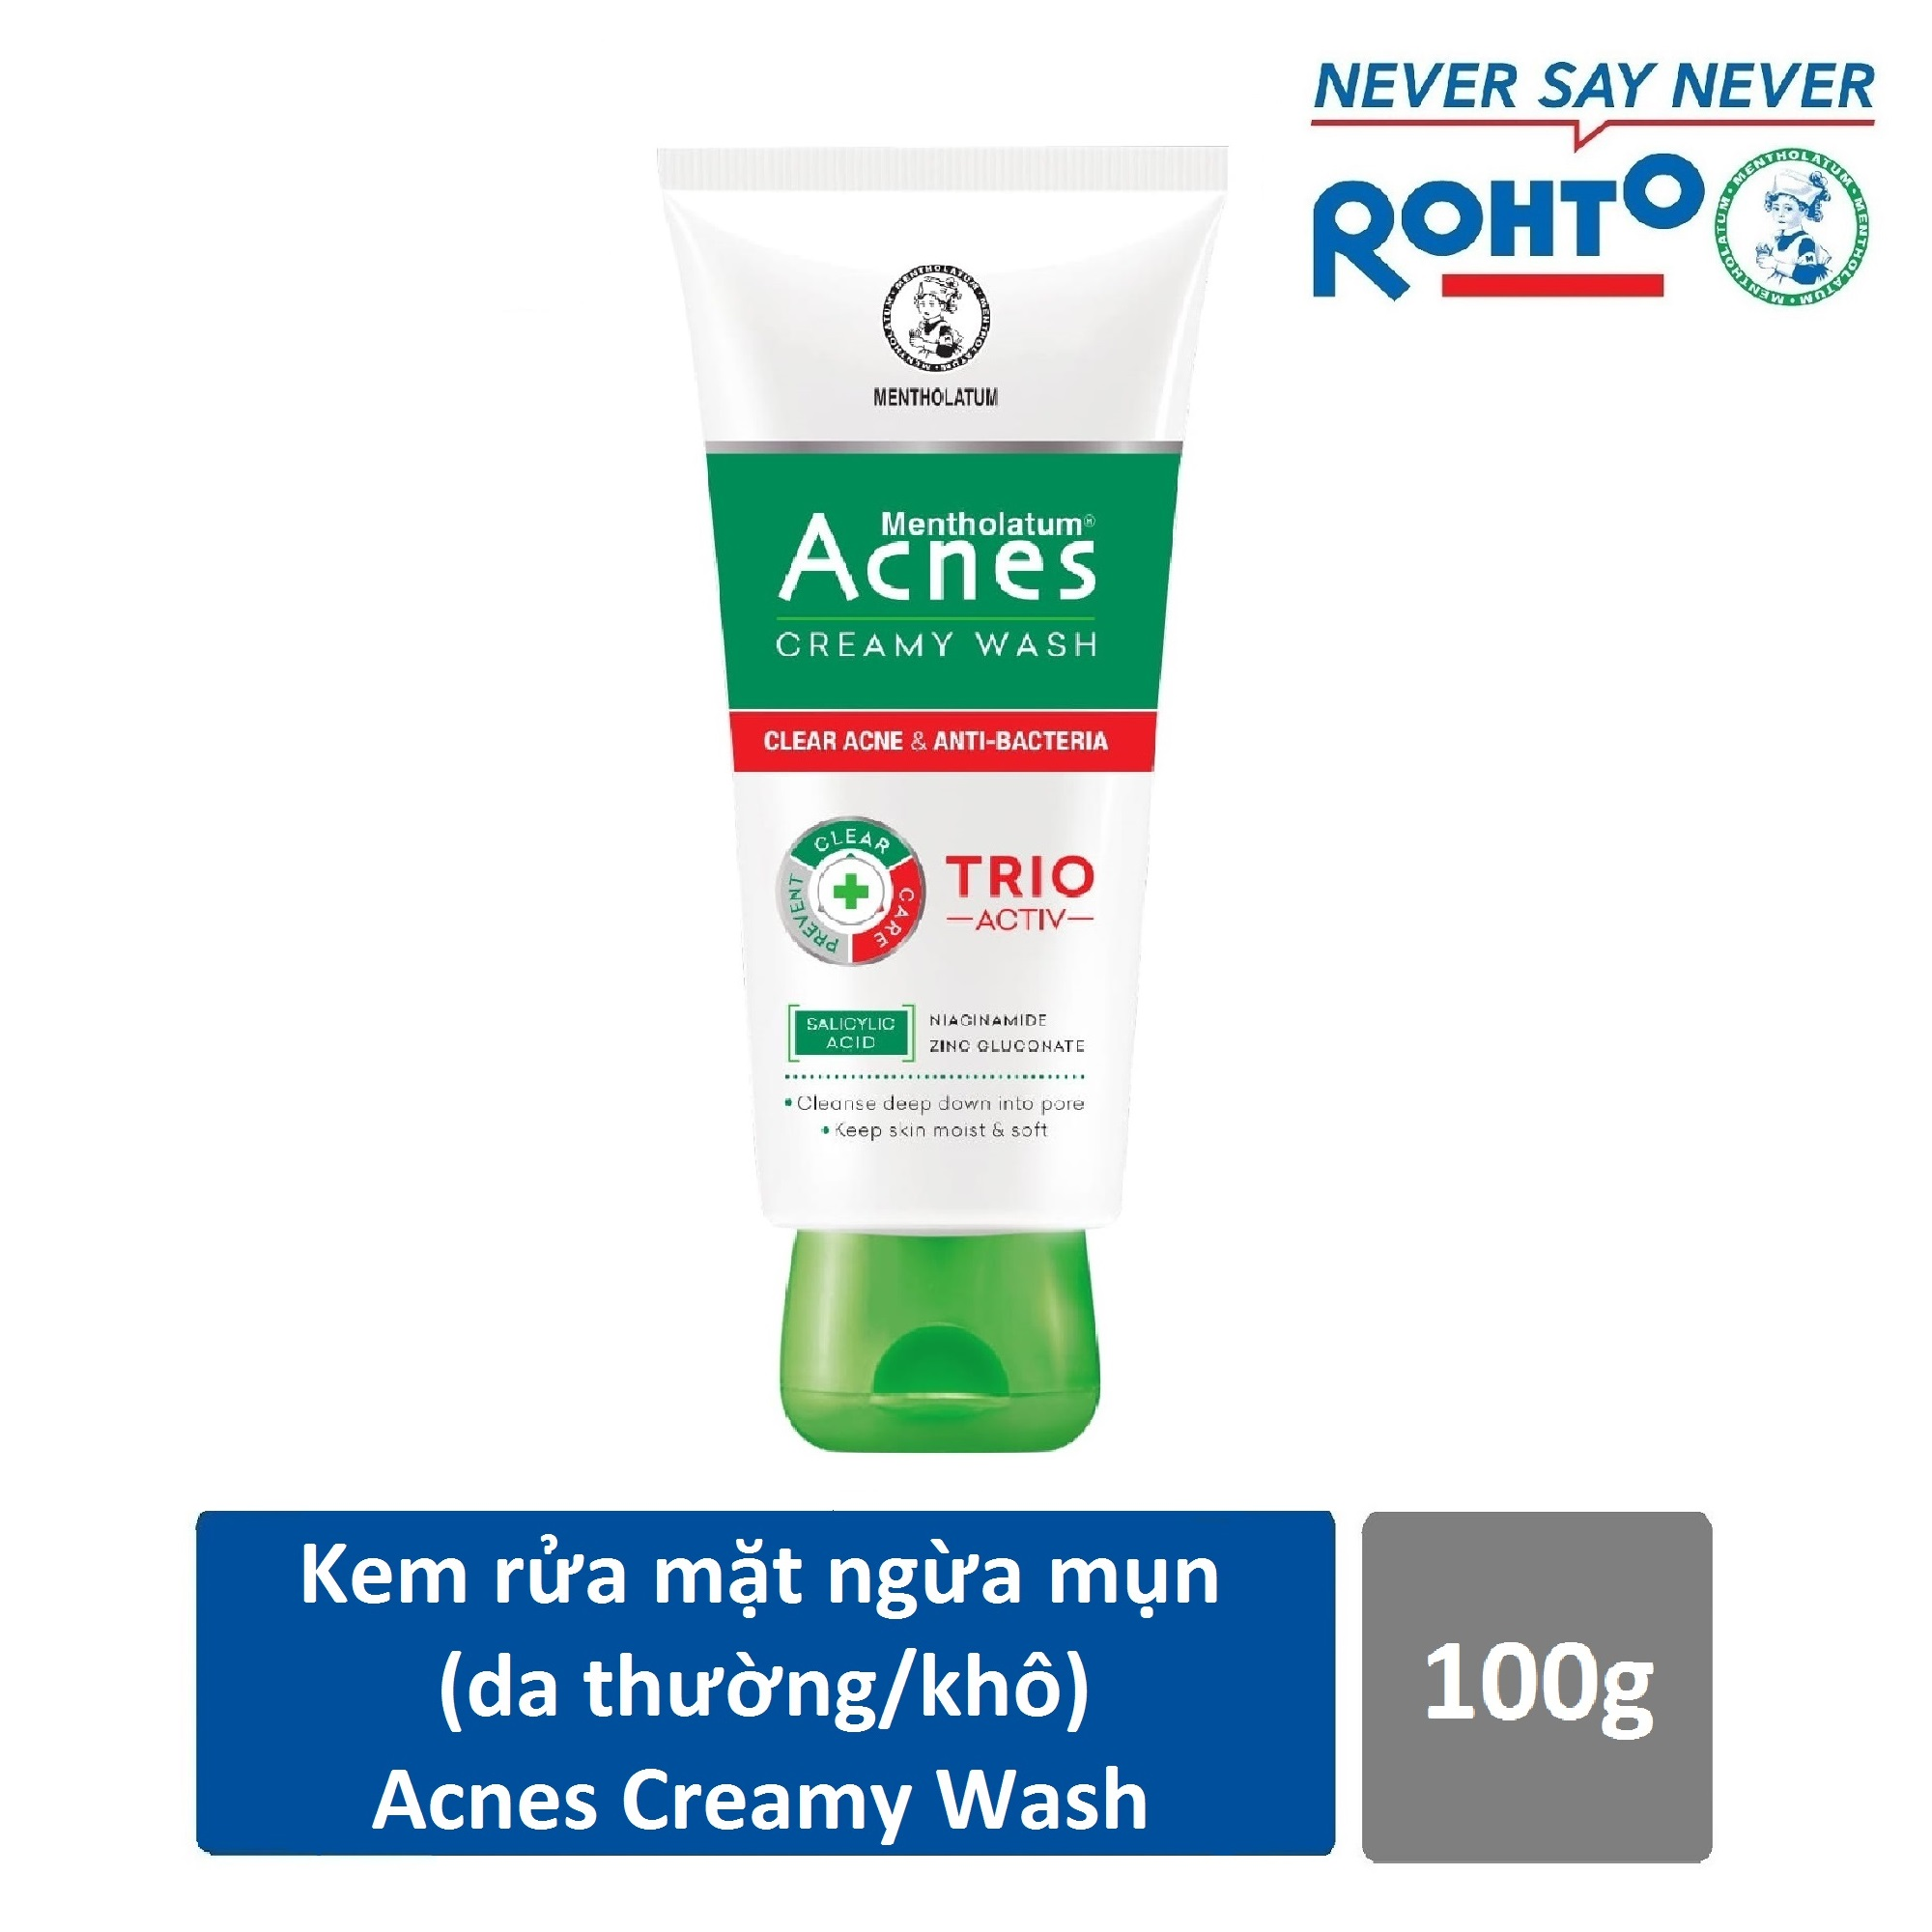 Sữa rửa mặt ngăn ngừa mụn Acnes Creamy Wash 100g cao cấp